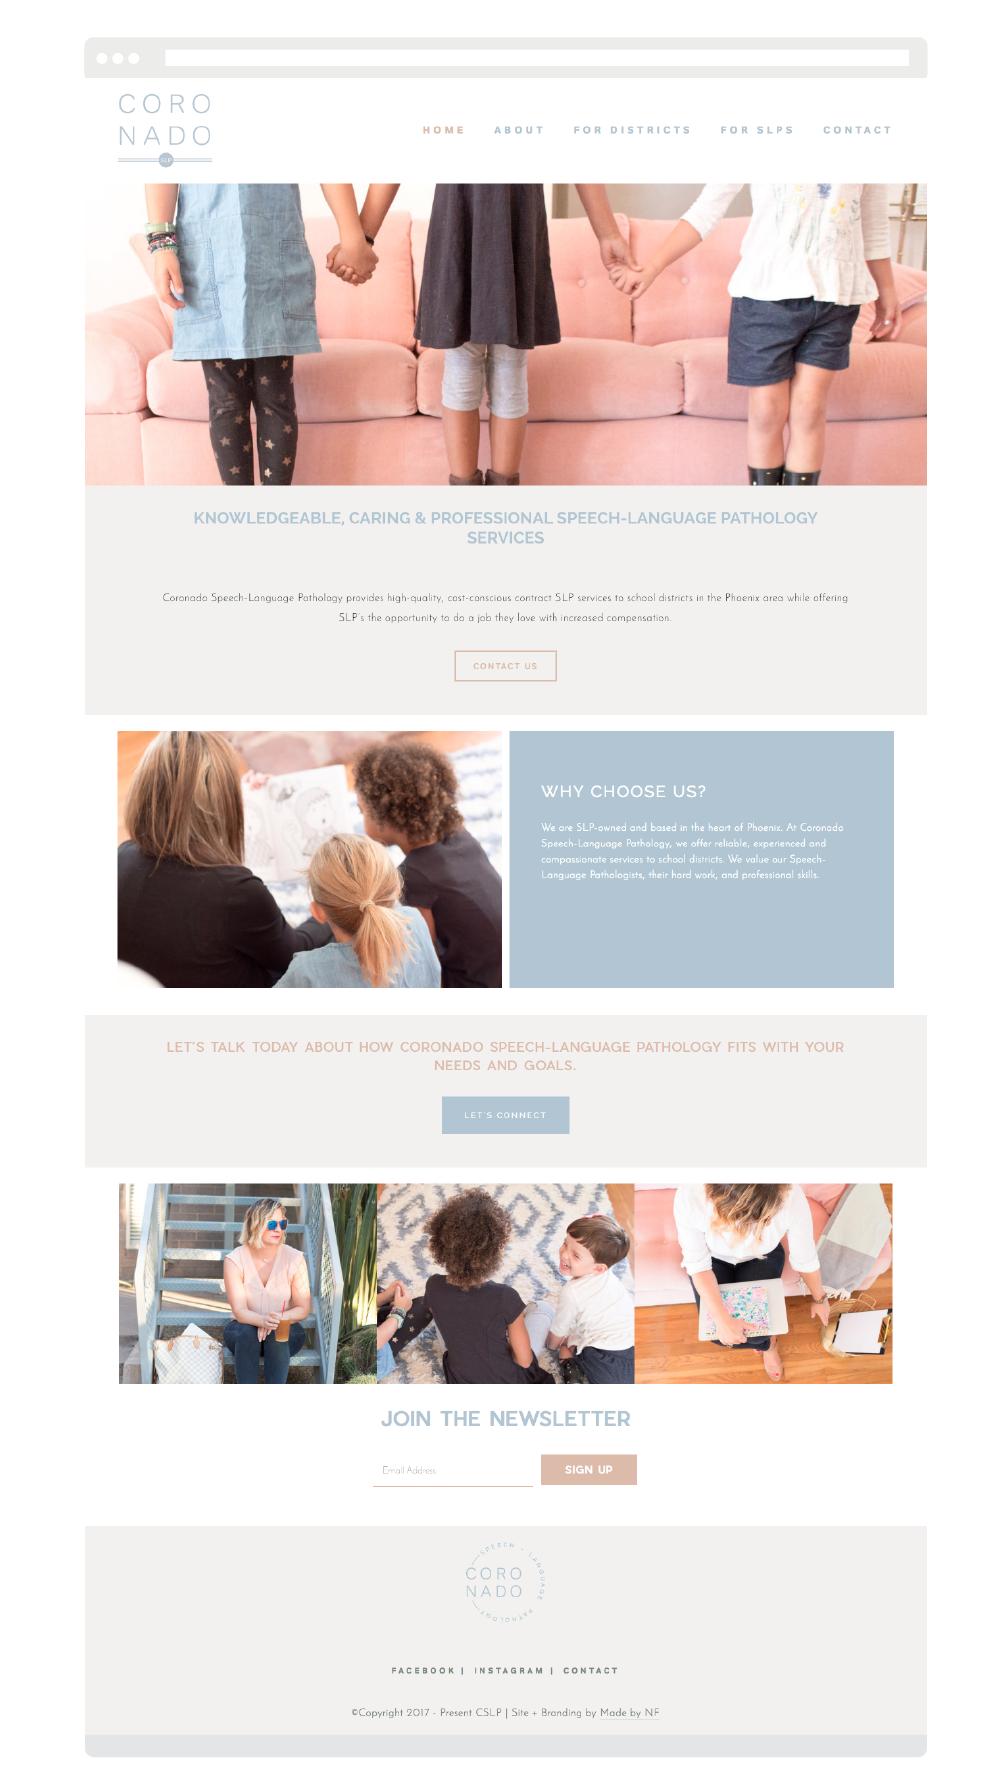 Custom-SquareSpace-Website-Designer---SquareSpace-Circle-Designer---Custom-Website---Made-by-NF.png